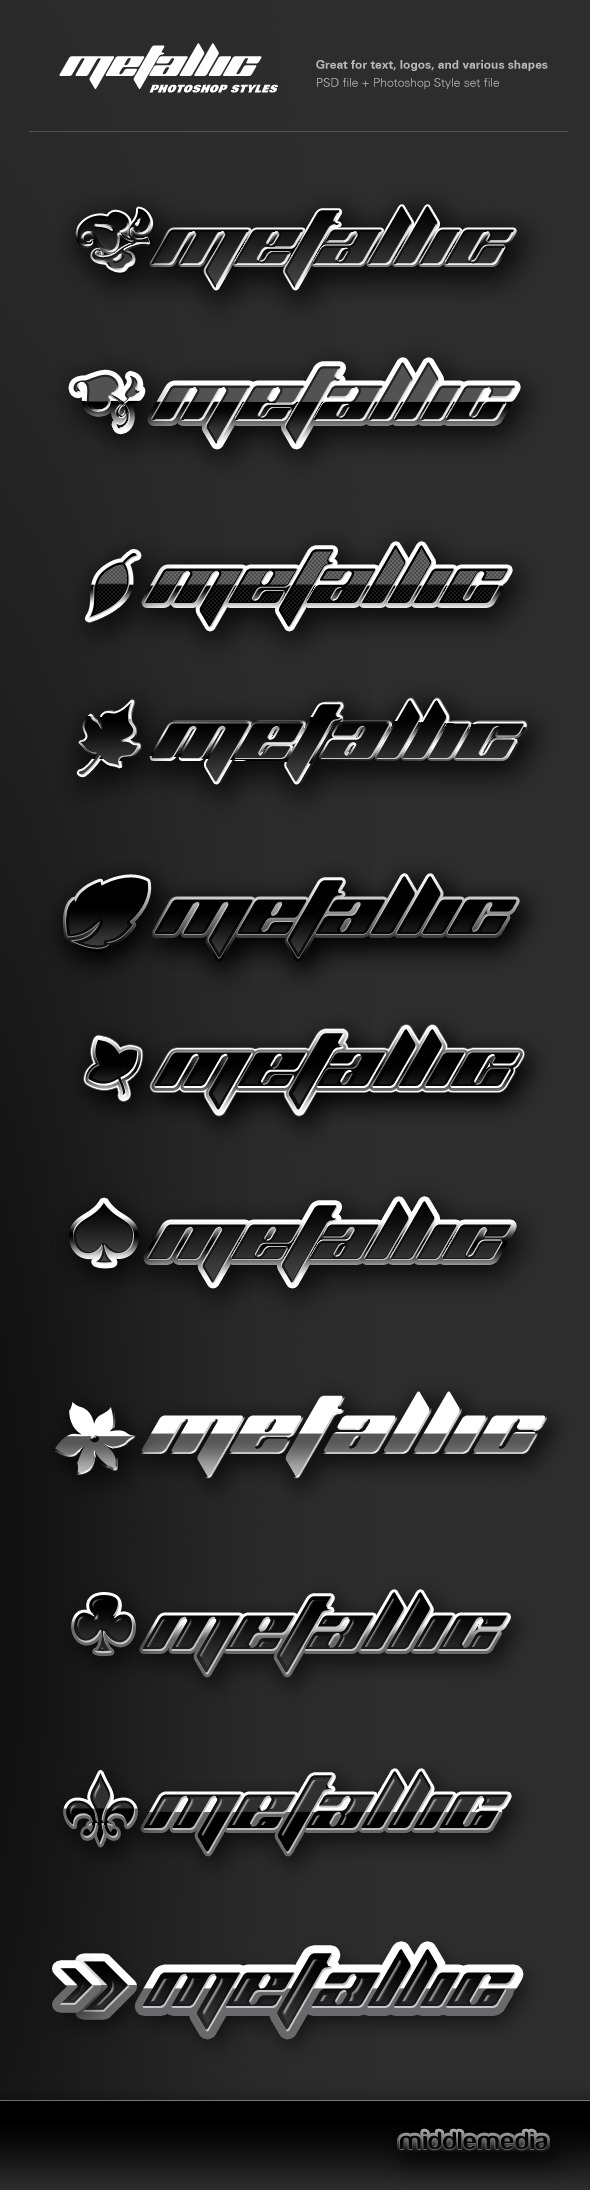 Metallic Chrome Photoshop Styles - Text Effects Styles